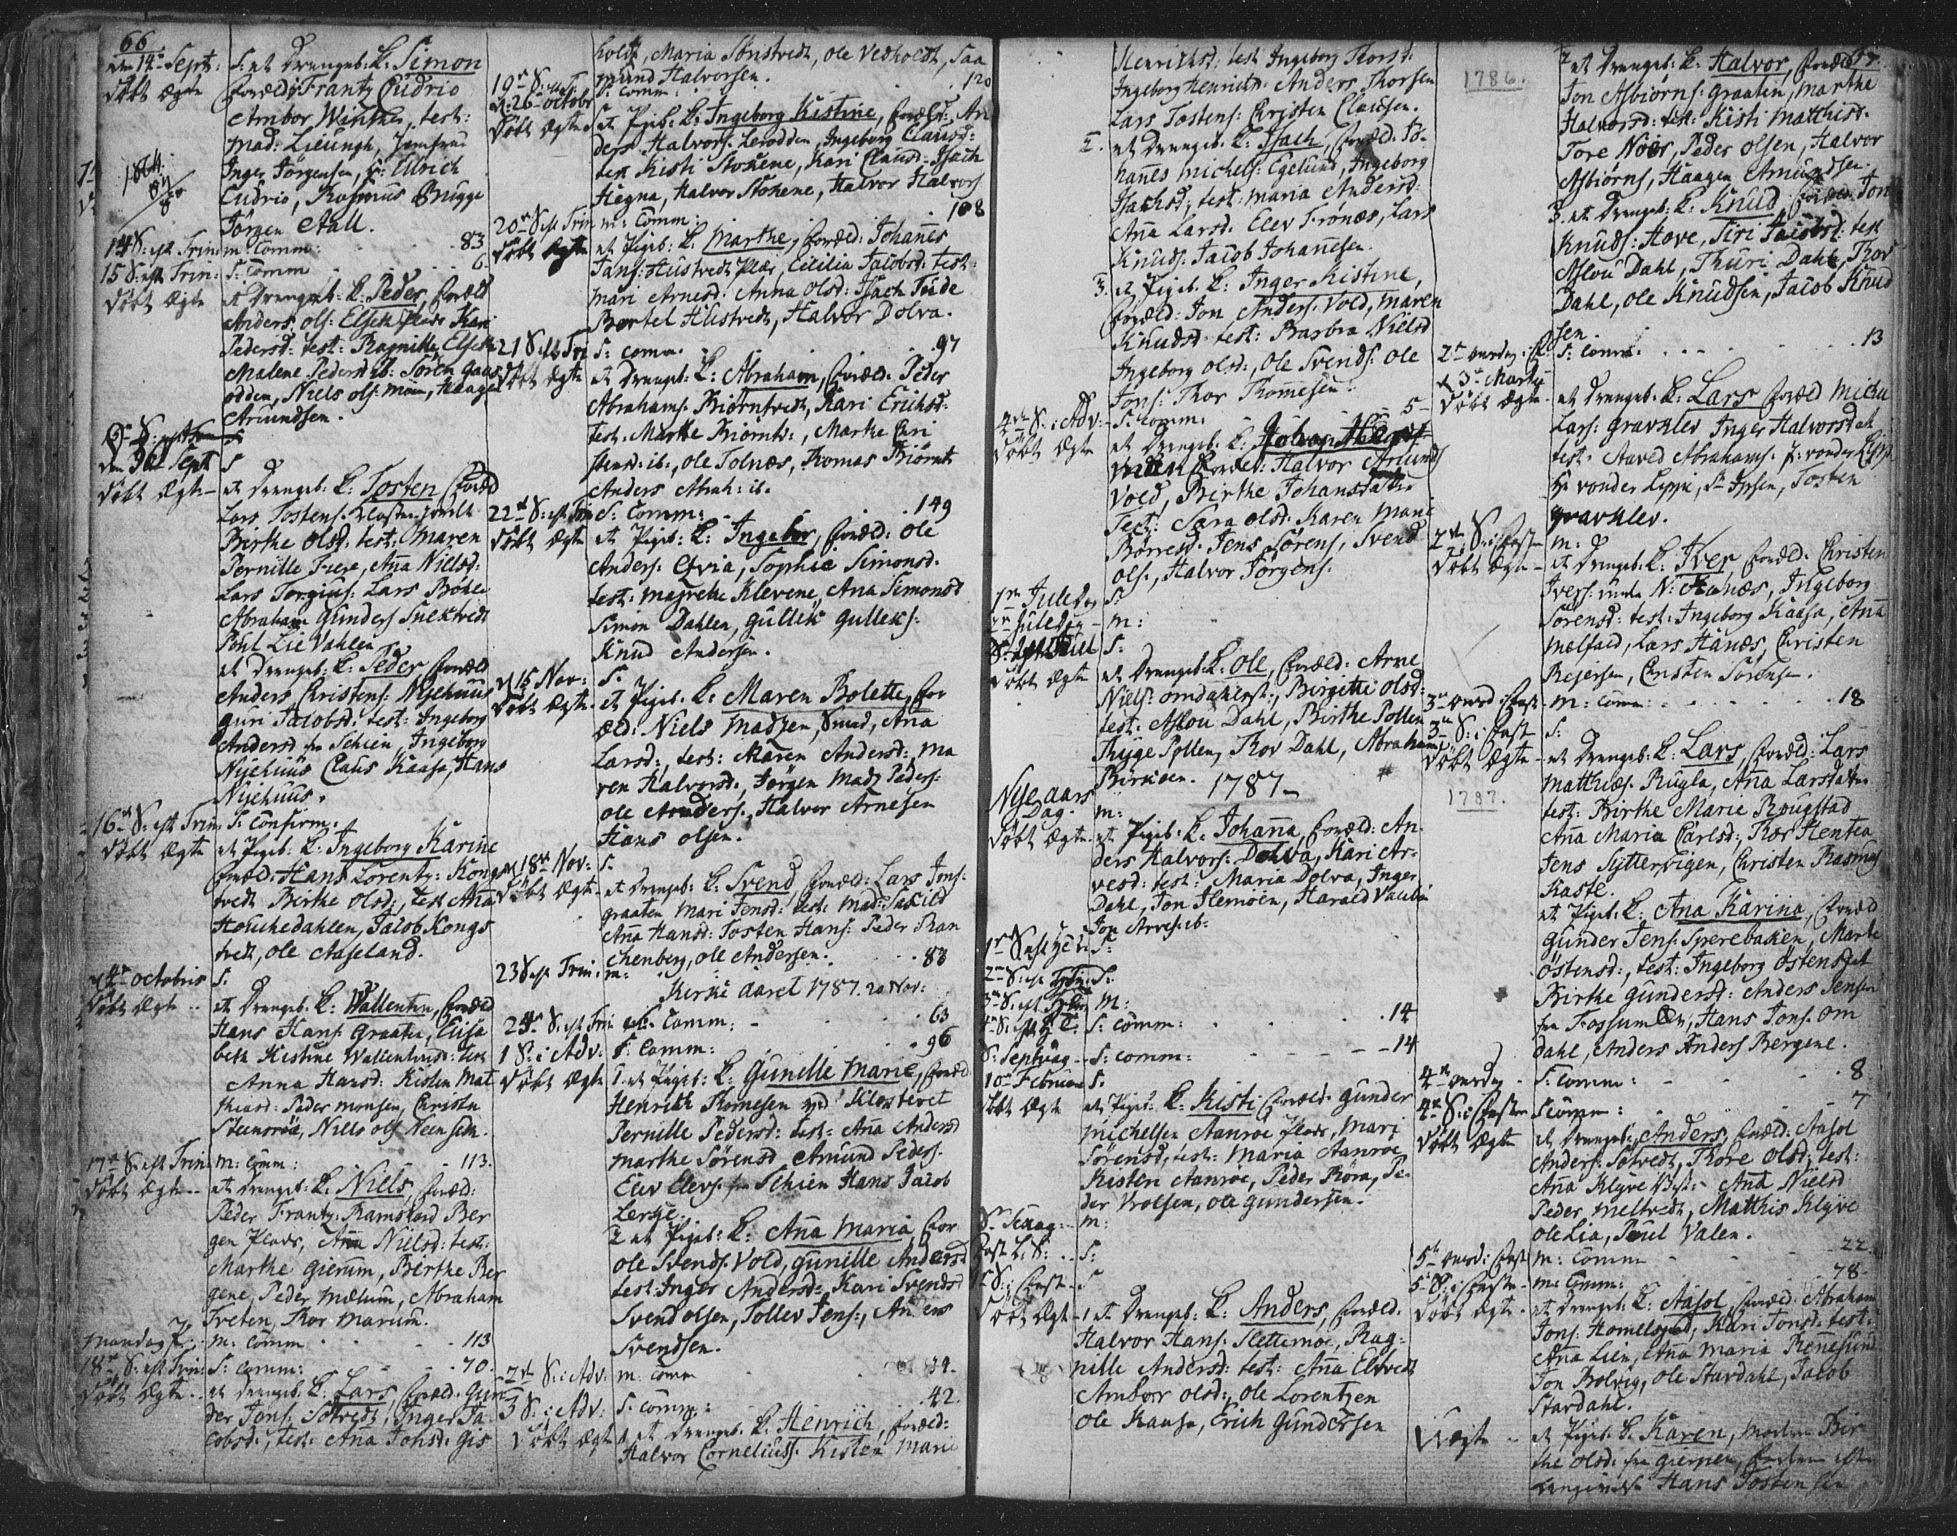 SAKO, Solum kirkebøker, F/Fa/L0003: Ministerialbok nr. I 3, 1761-1814, s. 66-67